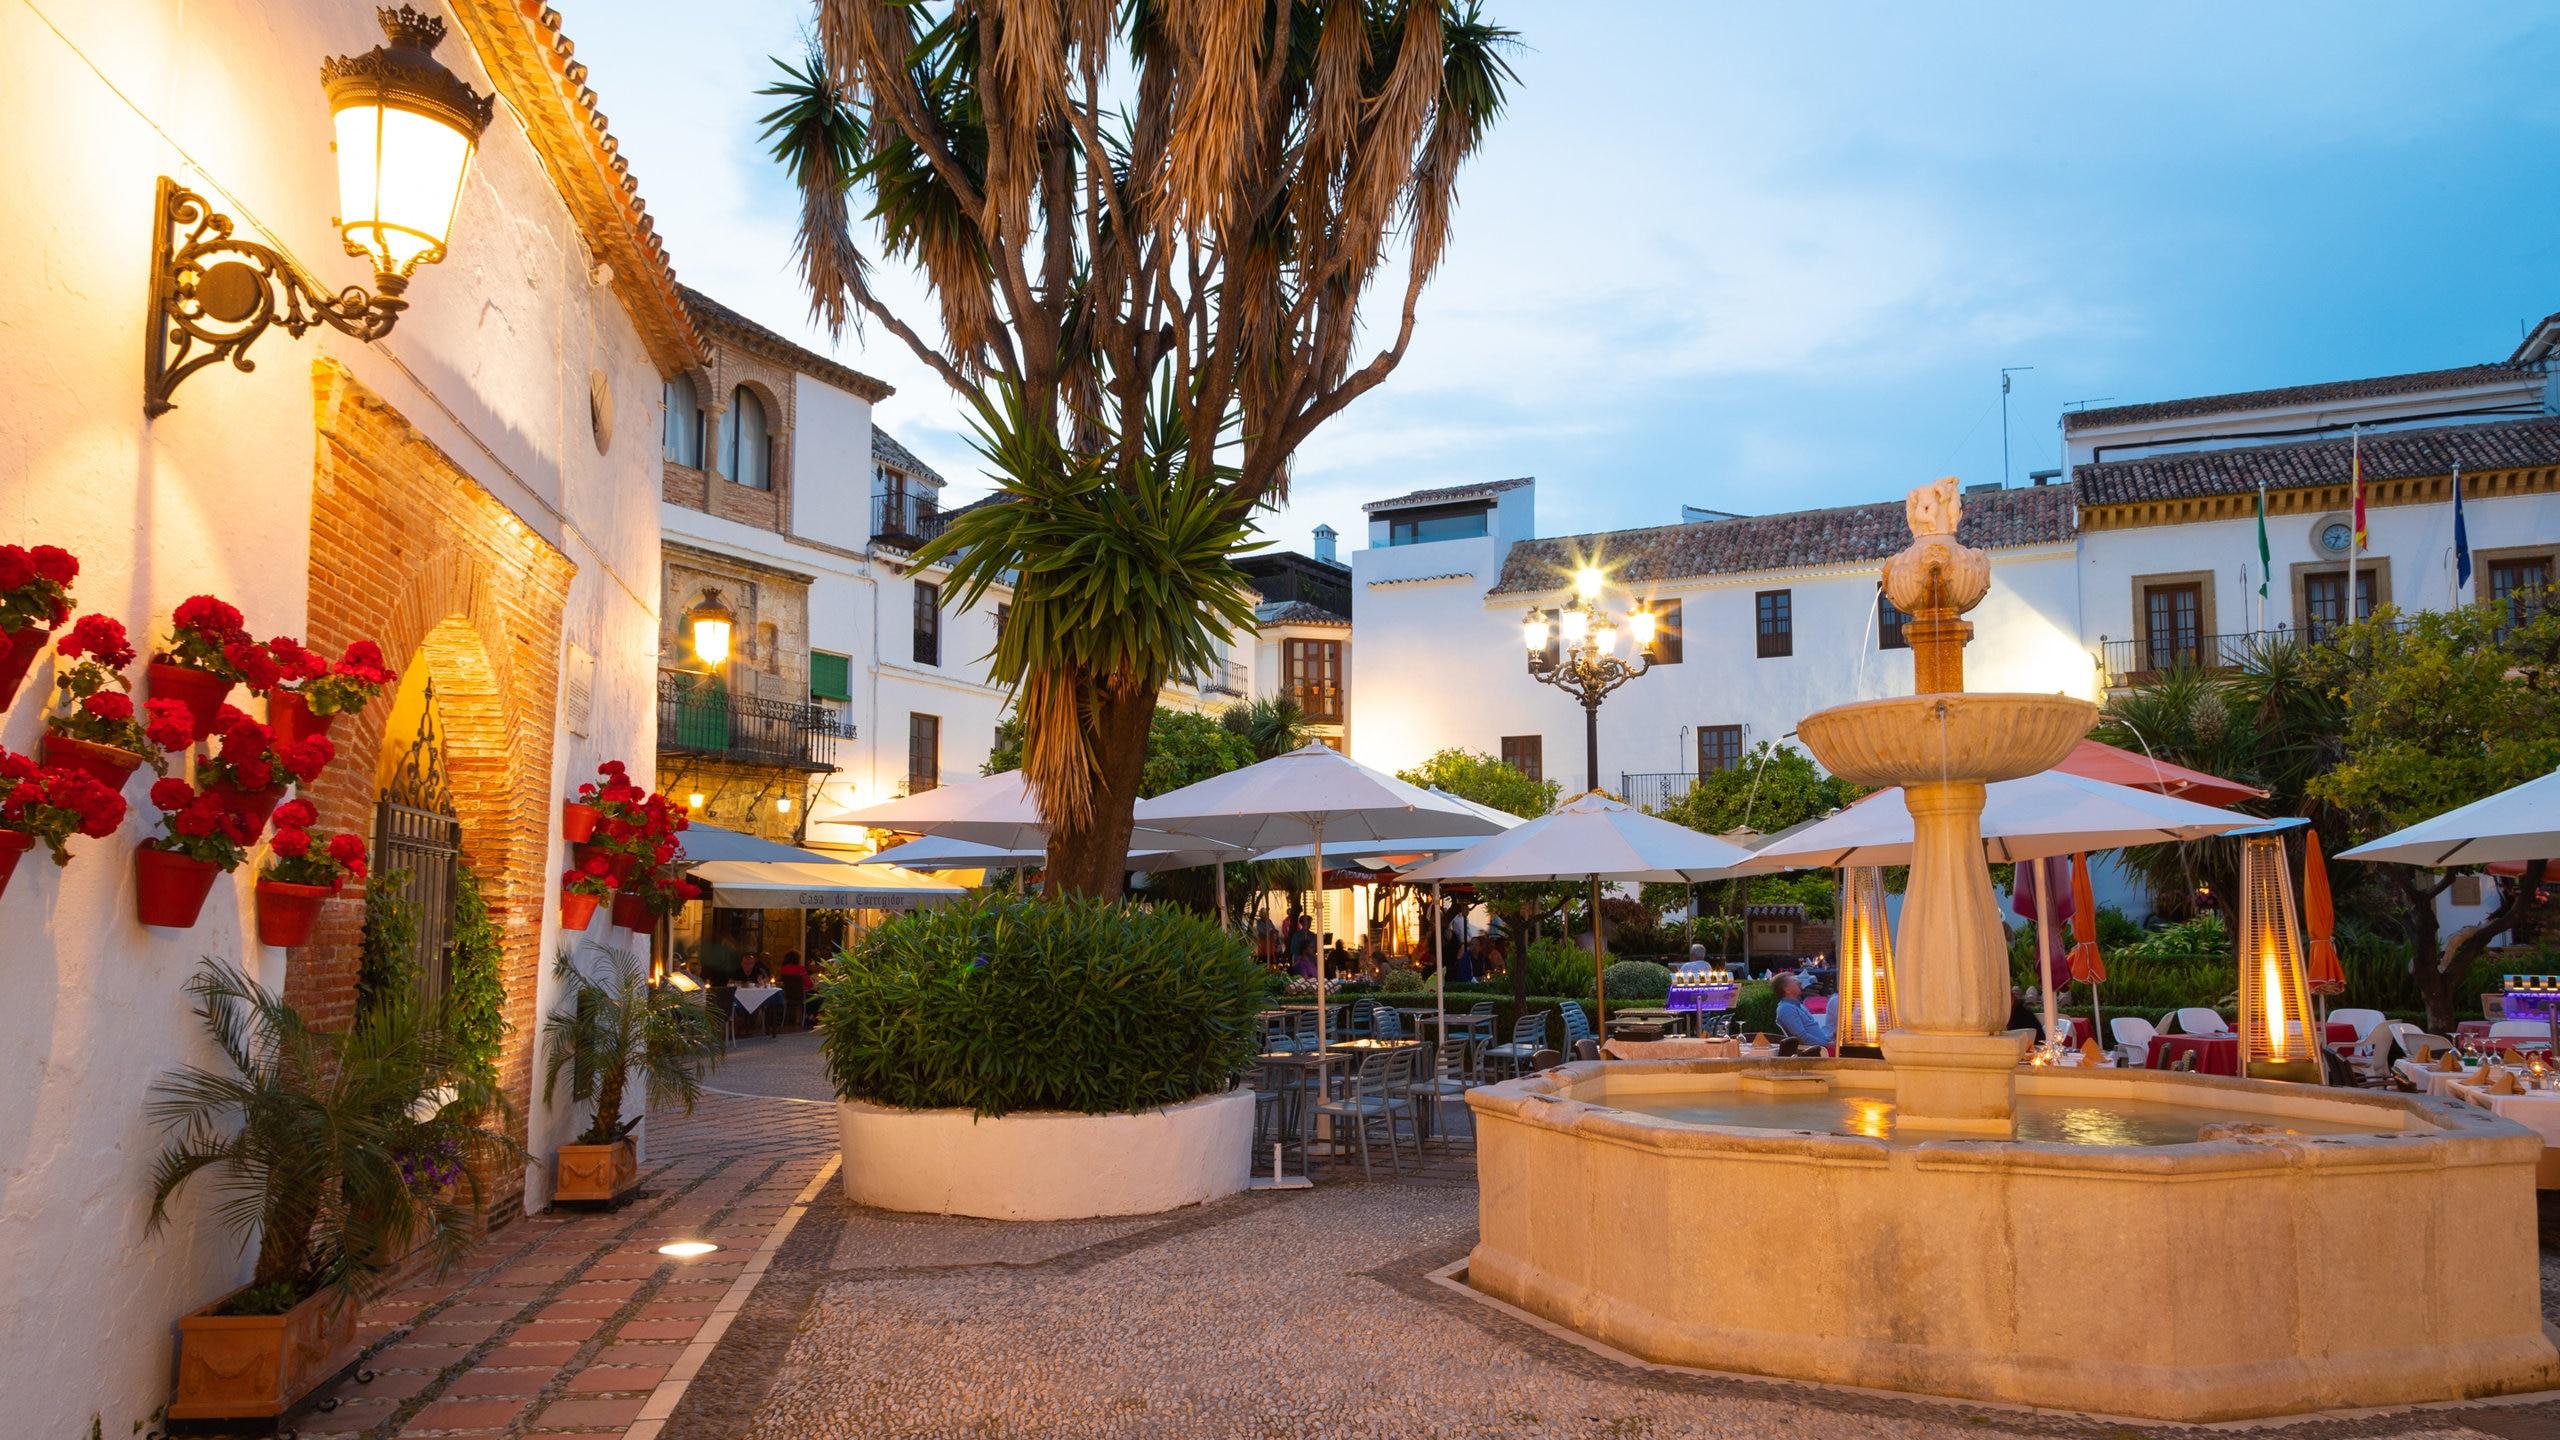 Stadscentrum van Marbella, Marbella, Andalusië, Spanje